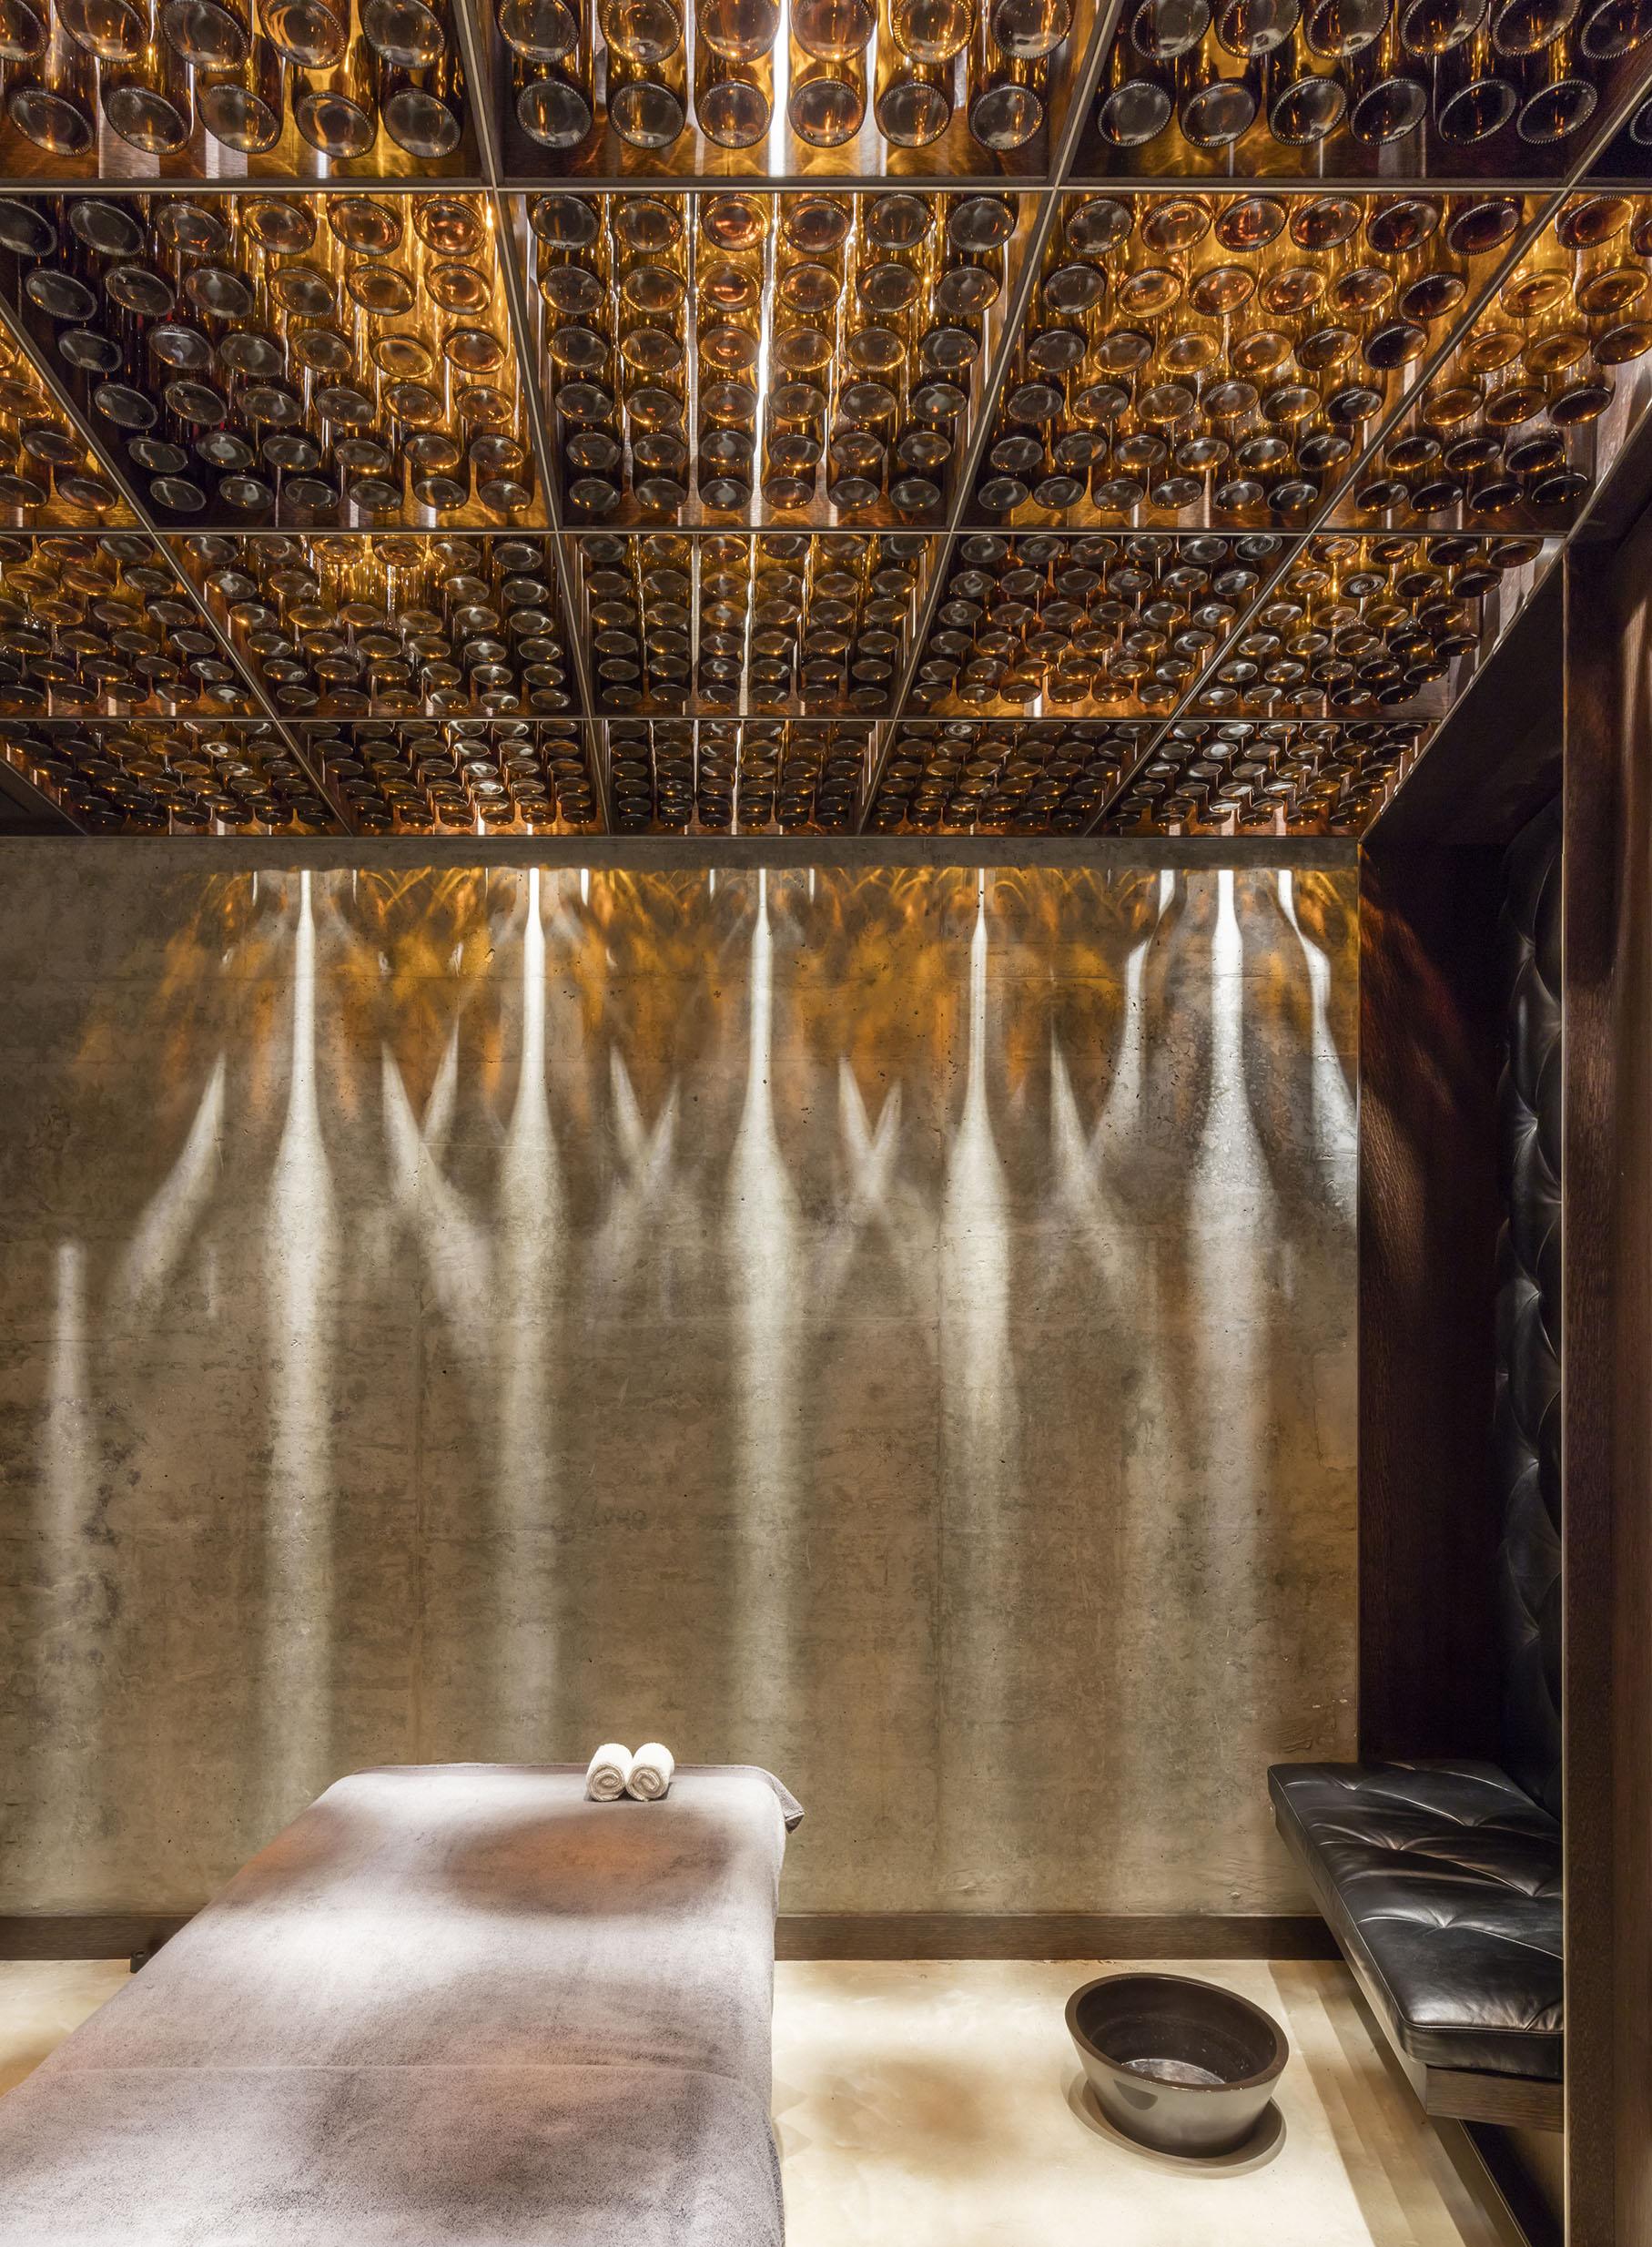 Chaps & Co-Marina-Dubai-Barbershop-Massage-Room-Lighting-Interior-Architect.jpg